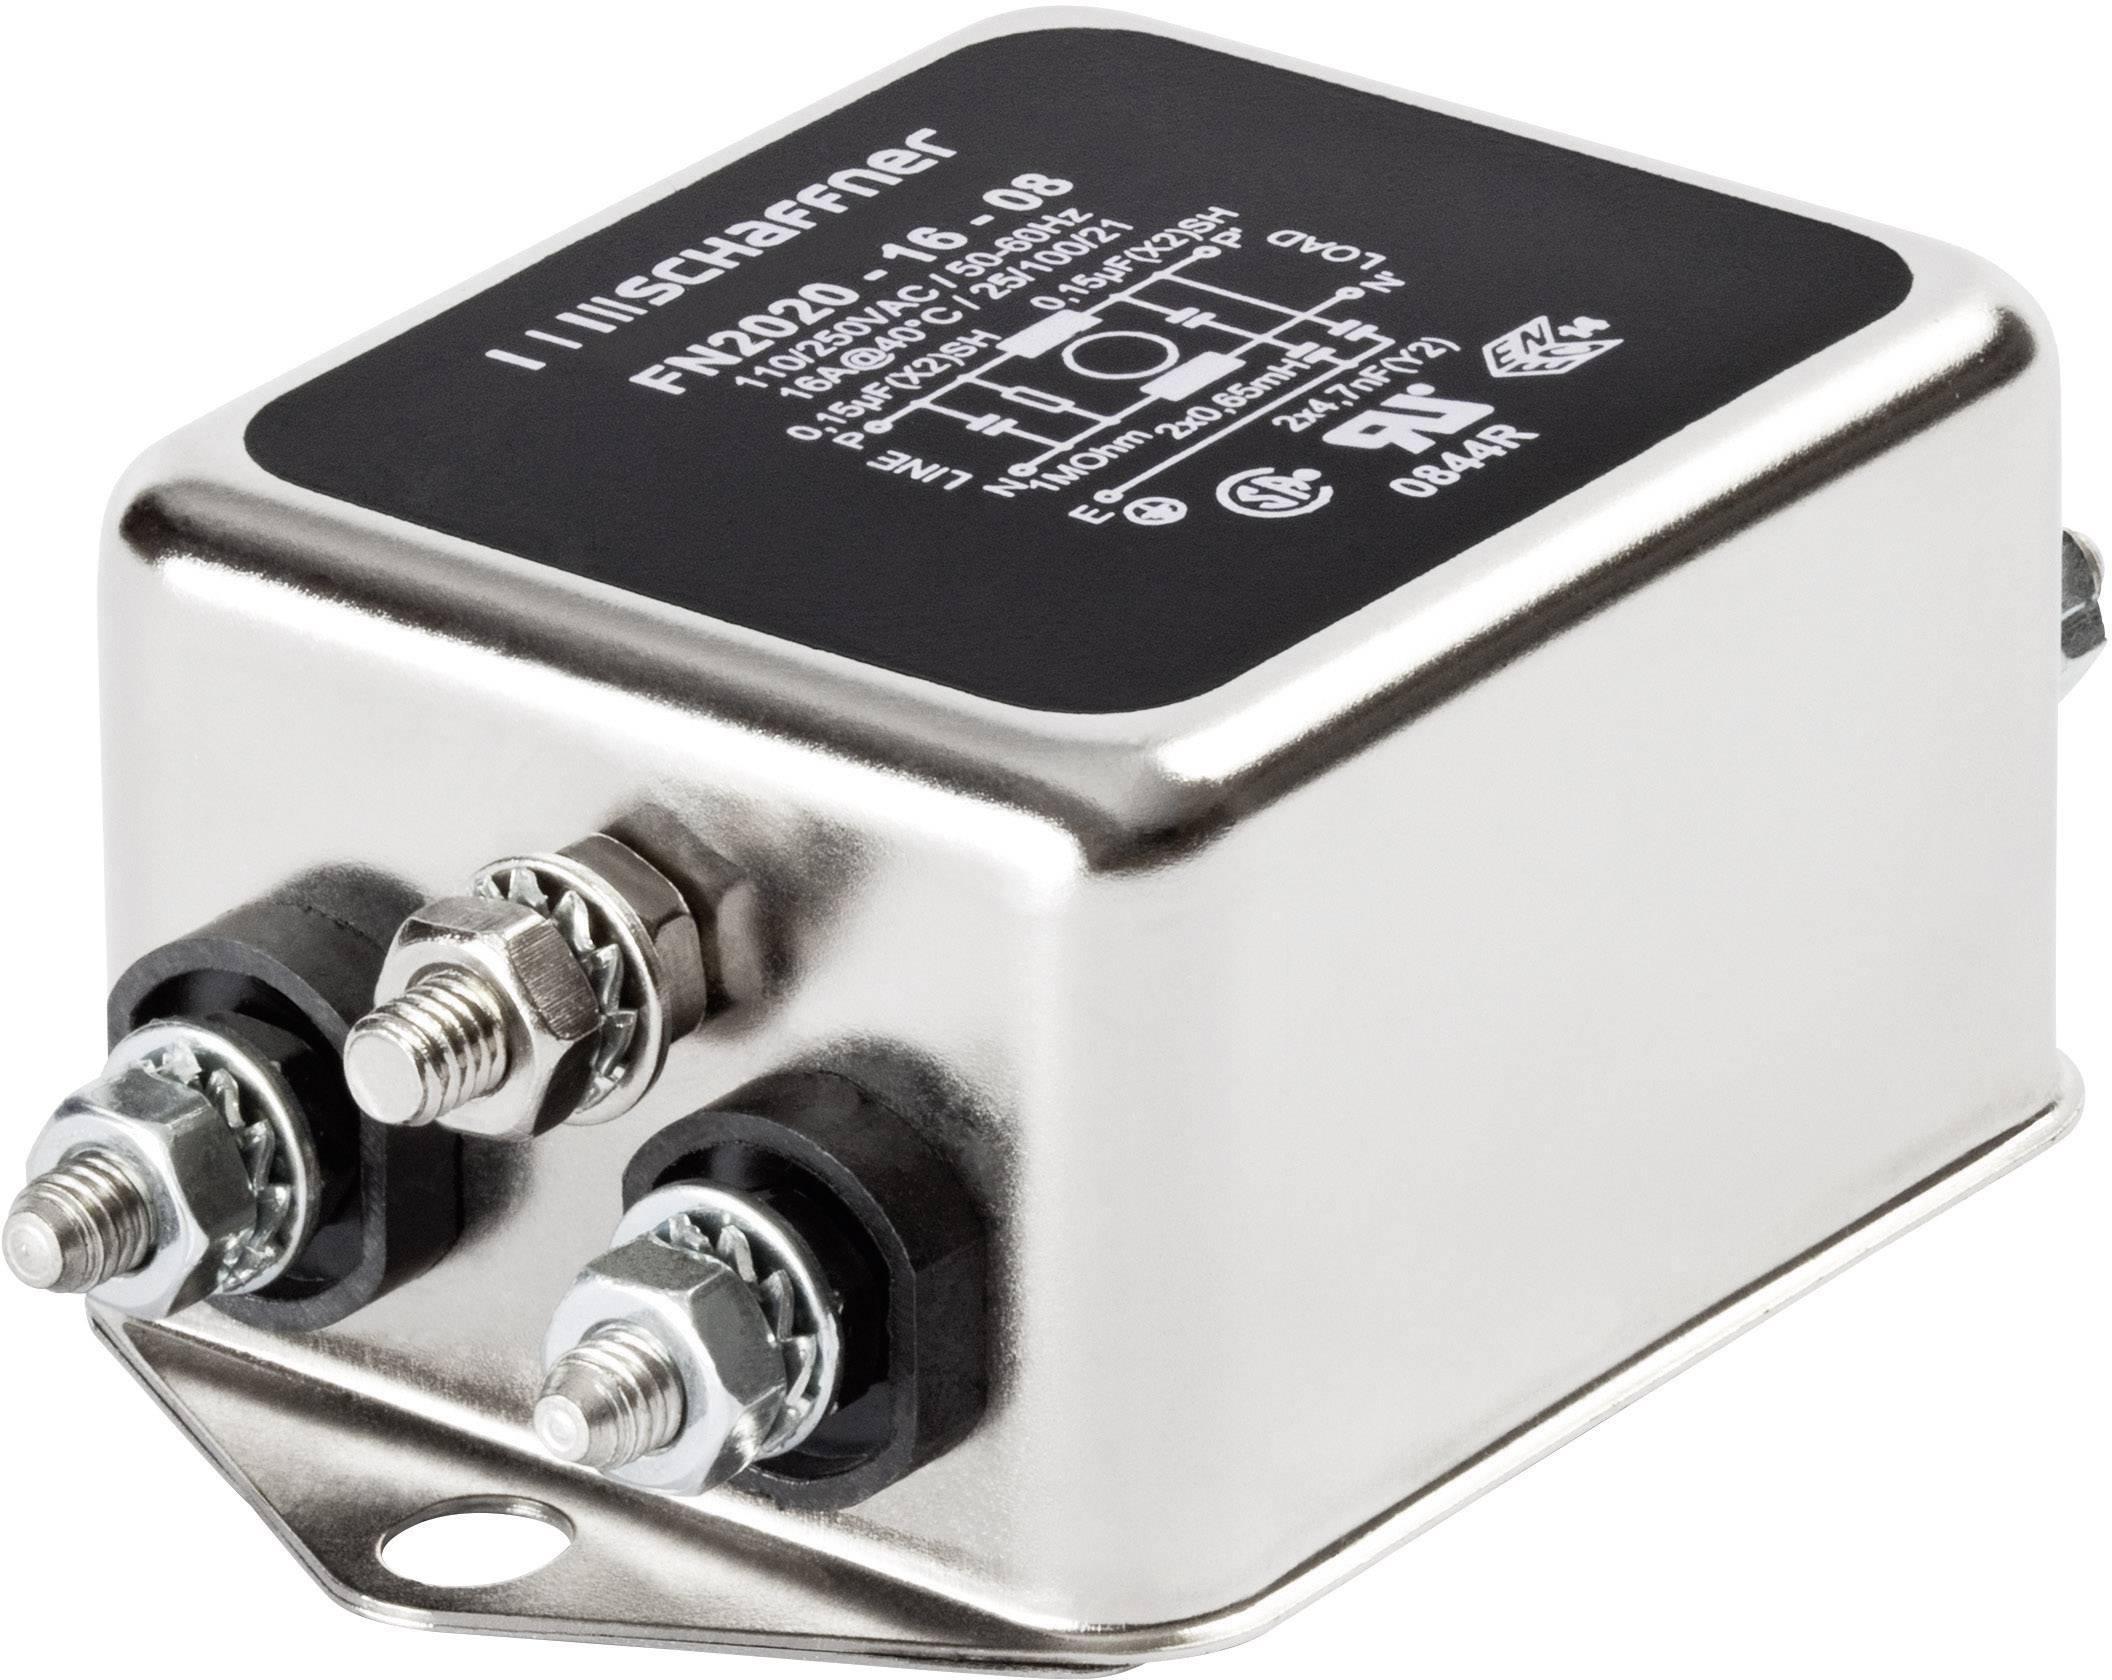 Odrušovací filter Schaffner FN 2020-20-06 FN 2020-20-06, 250 V/AC, 20 A, 0.6 mH, (š x v) 85 mm x 29.3 mm, 1 ks